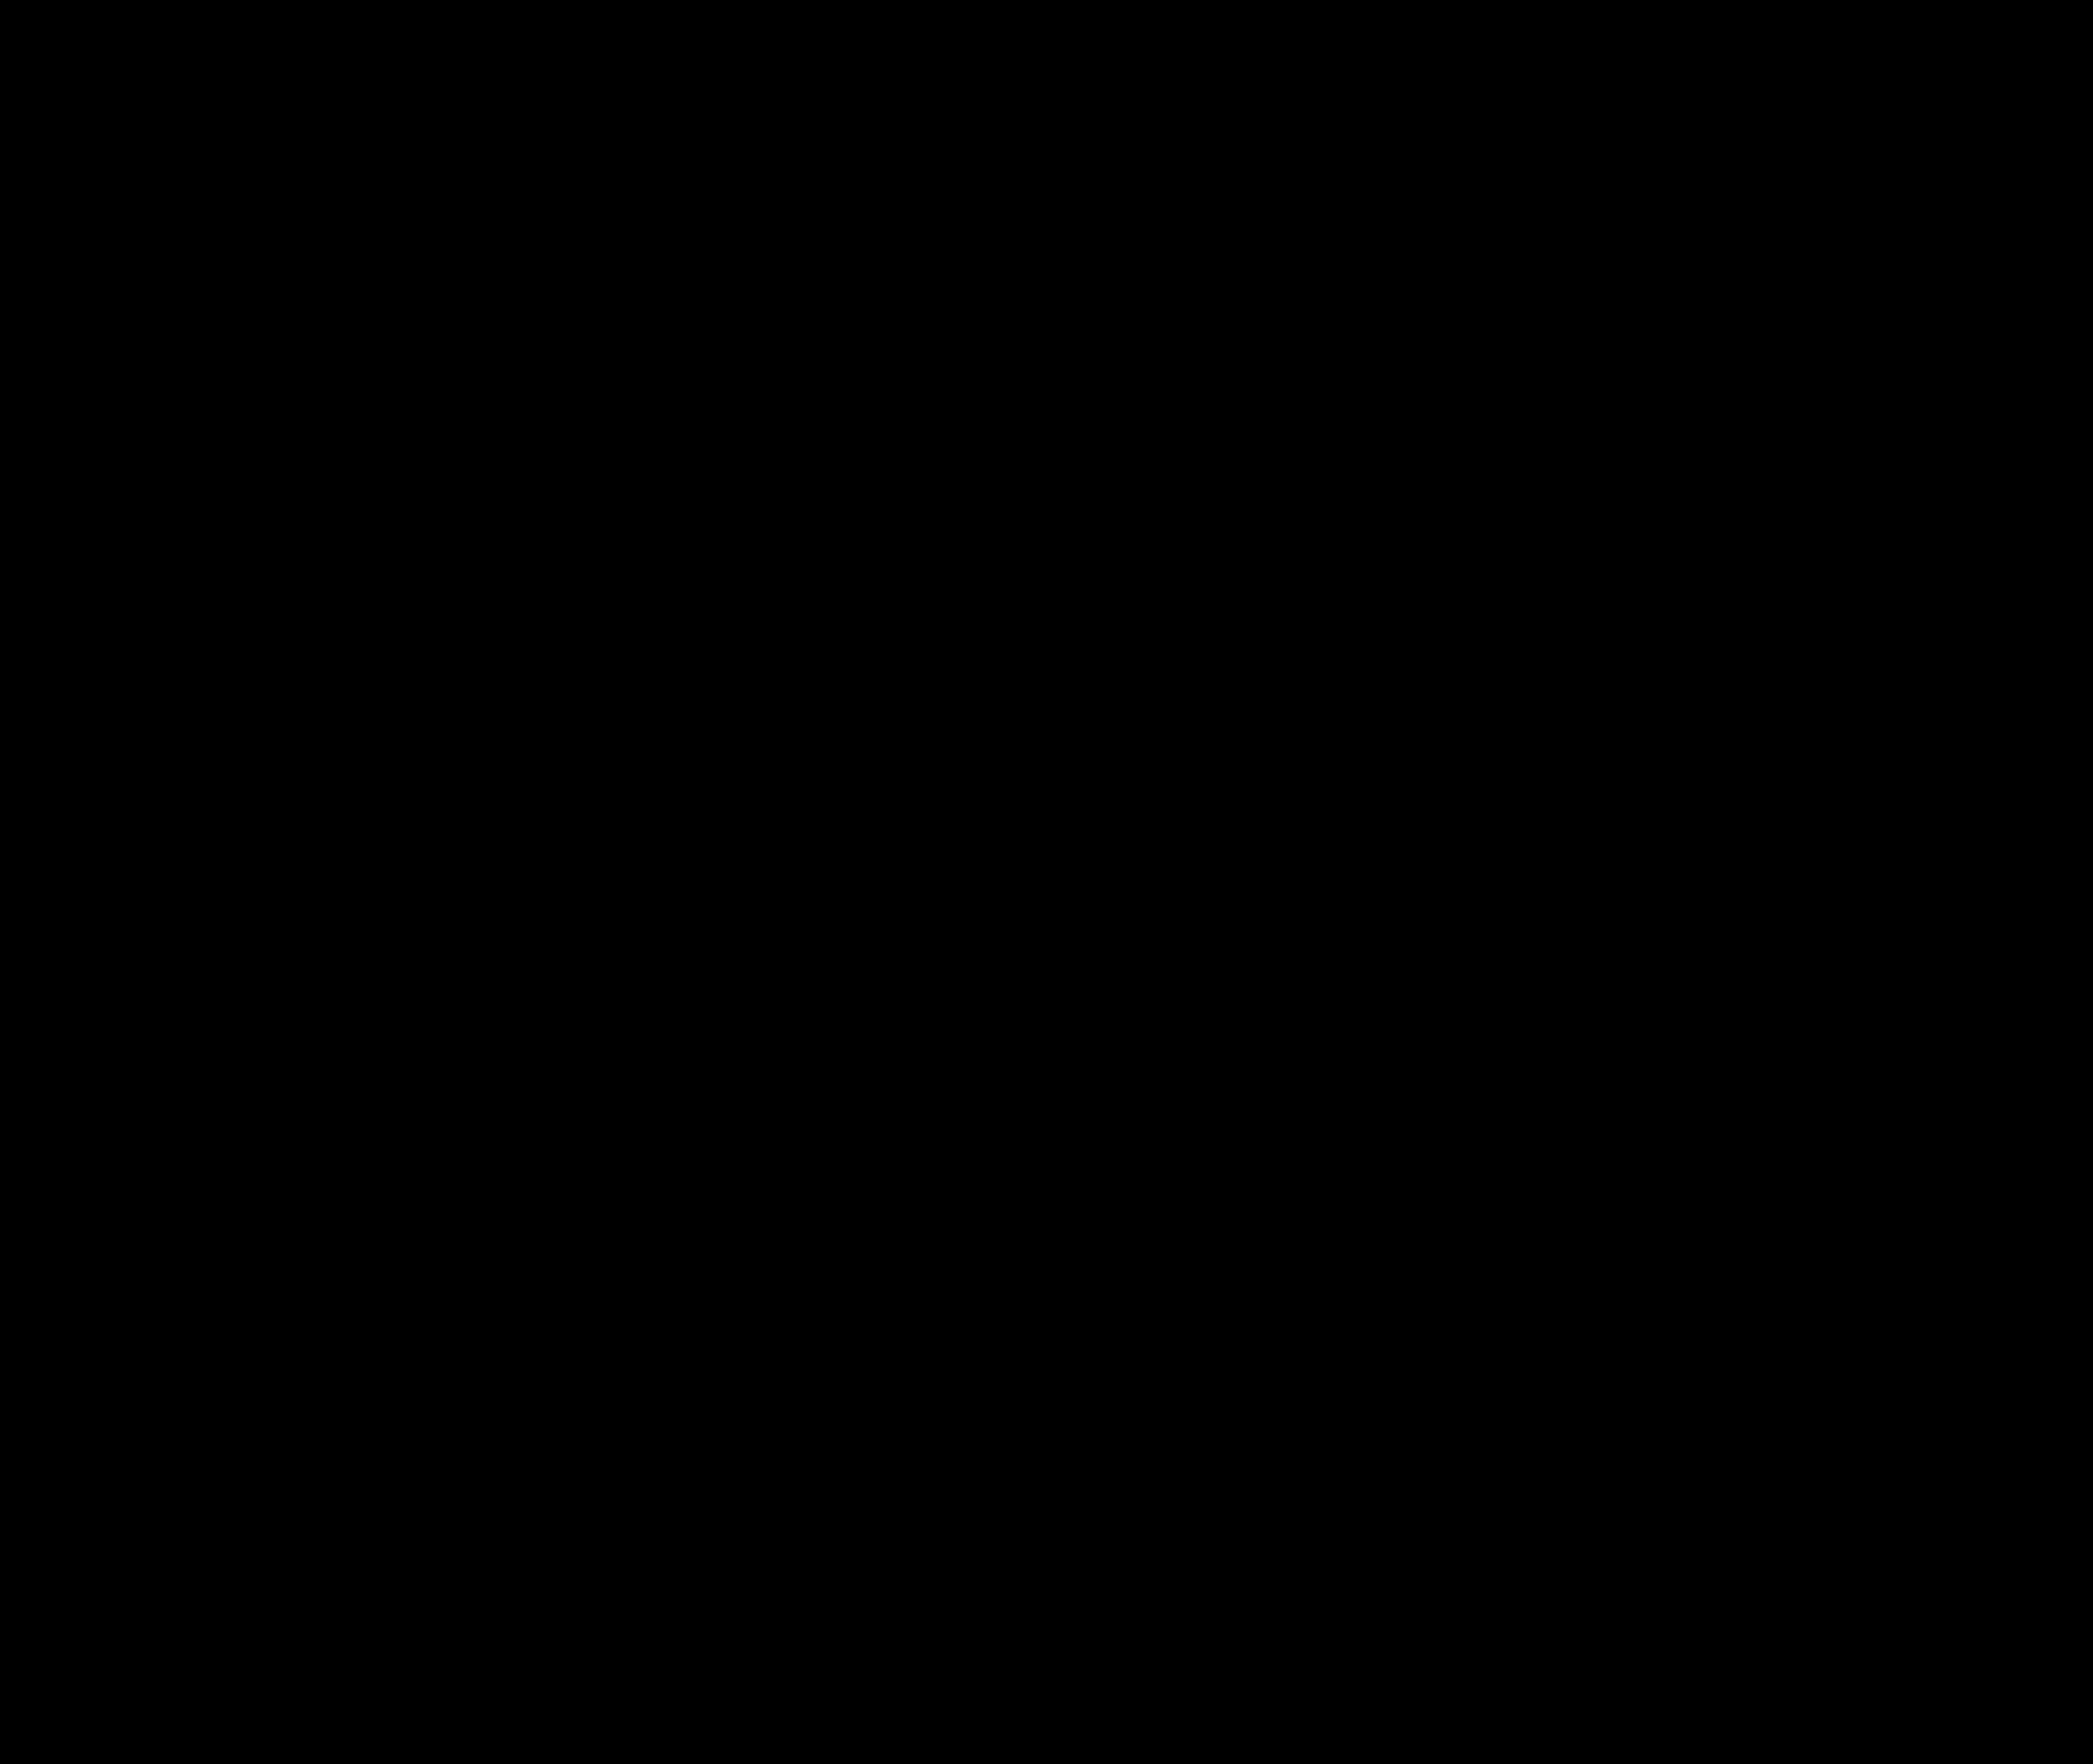 2500x2107 Vector Graphics Design Background Png Vector Elements Elements